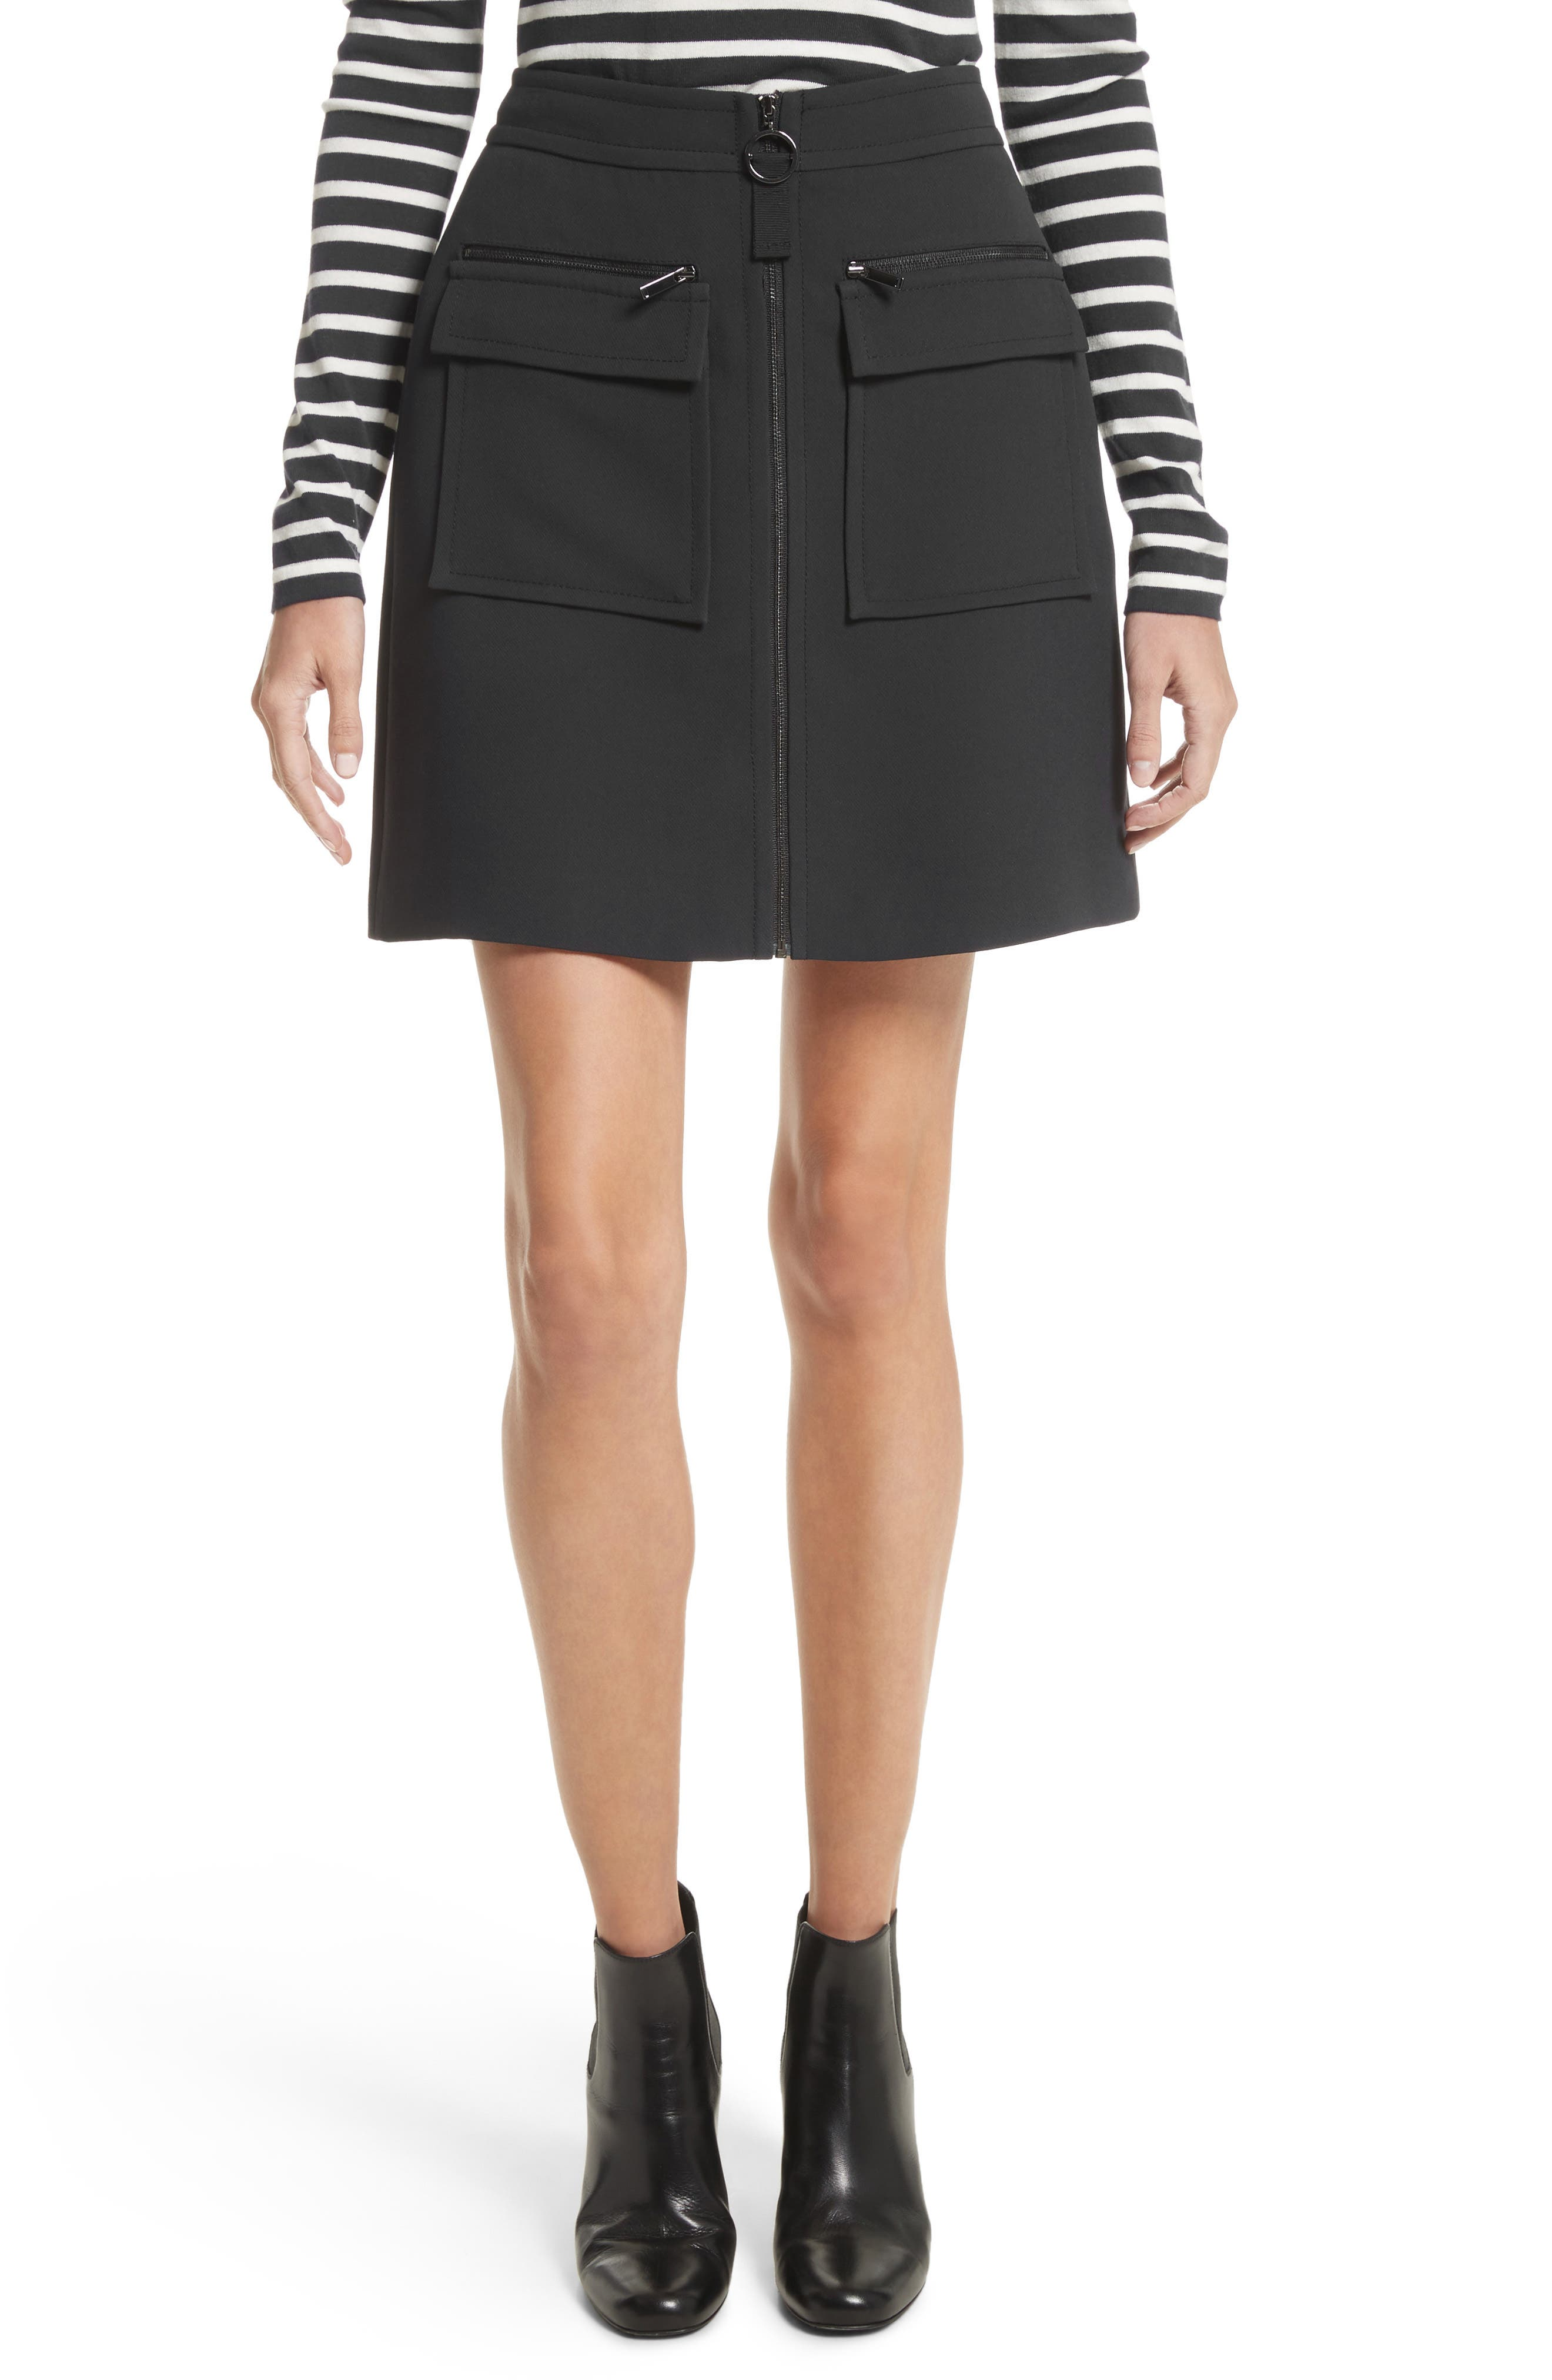 GREY Jason Wu Crepe Miniskirt